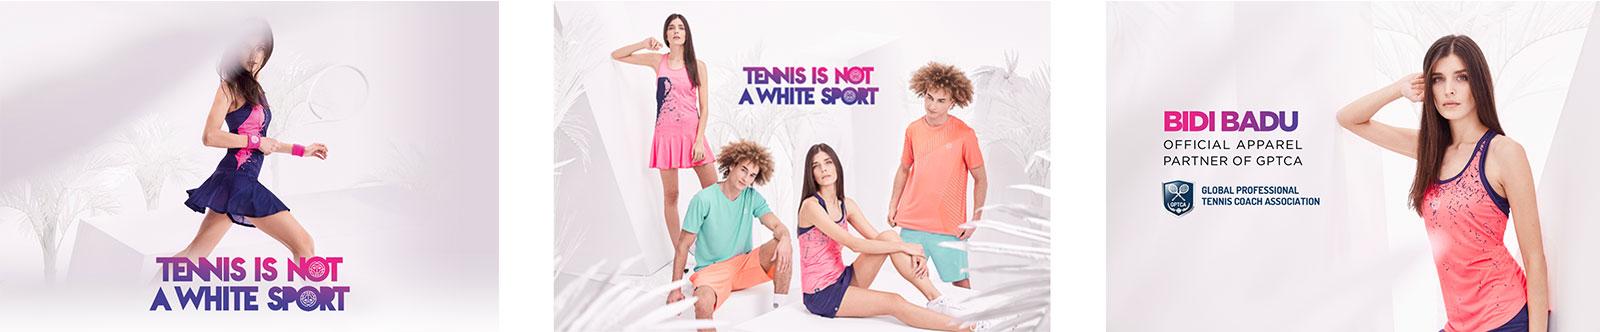 Bidi Badu ropa deportiva DMsport